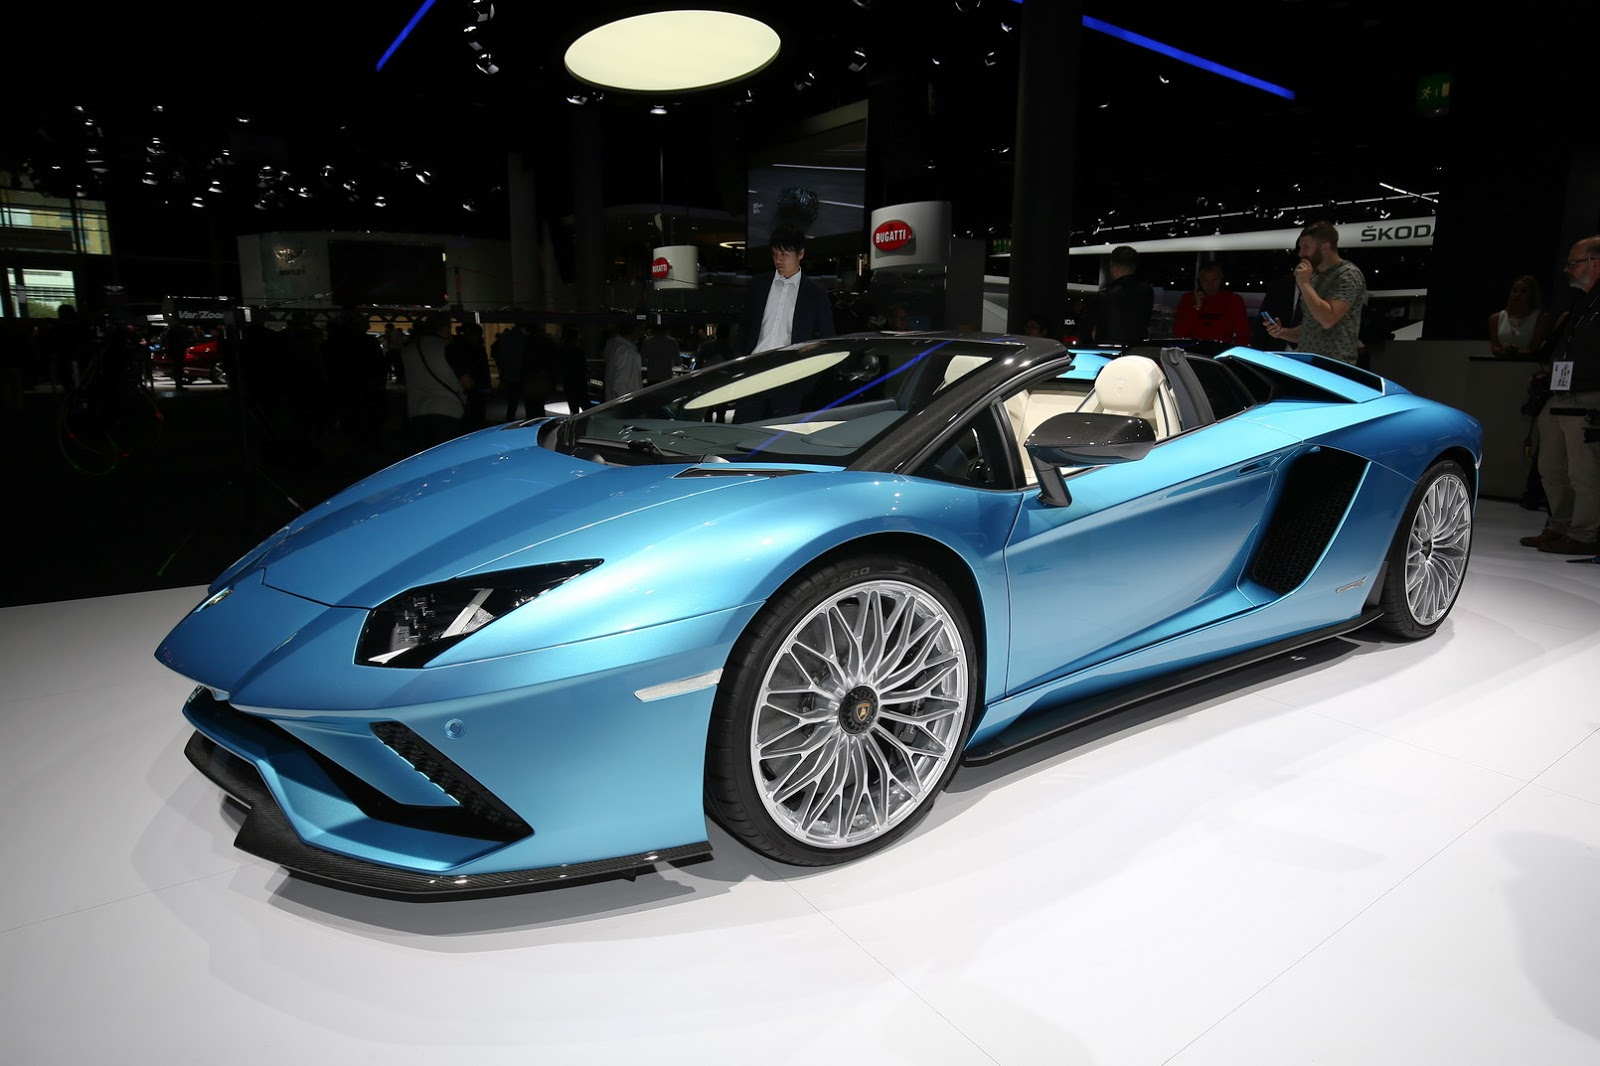 Lamborghini Aventador Roadster S facelift (23)